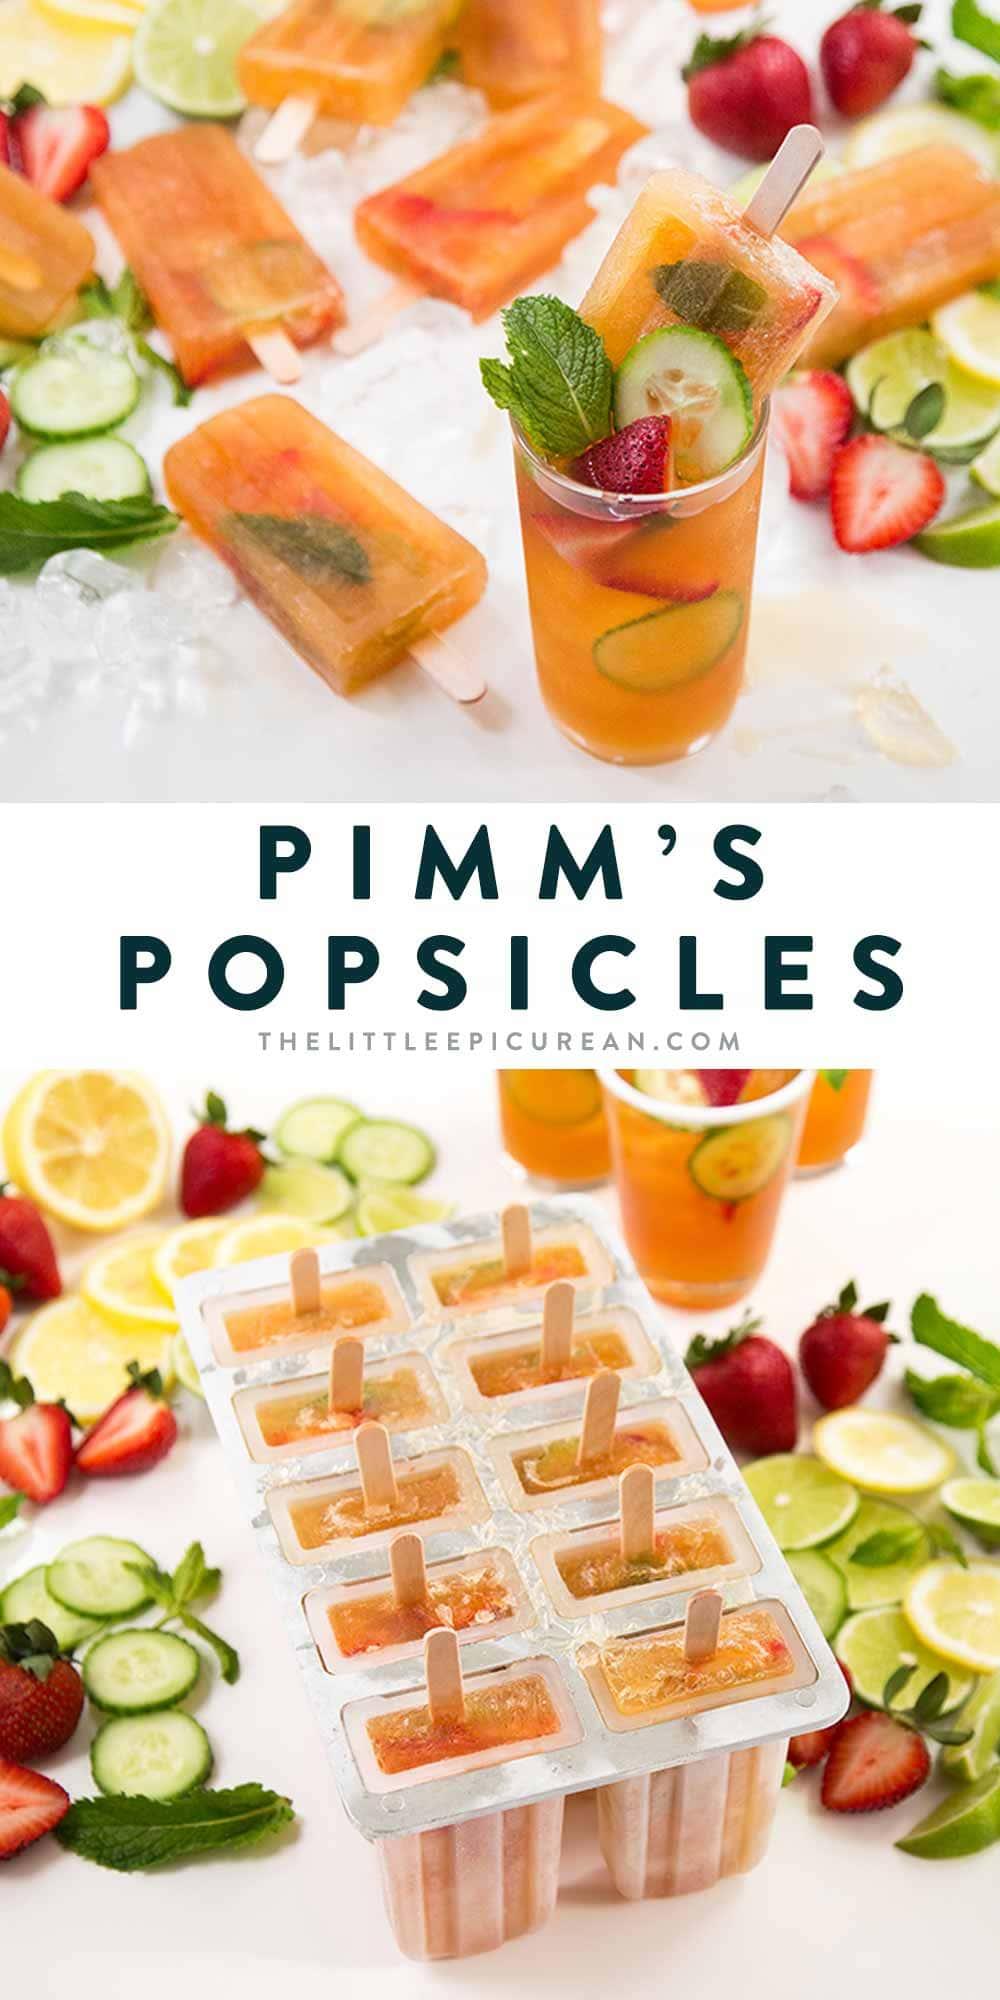 Pimm's Popsicles